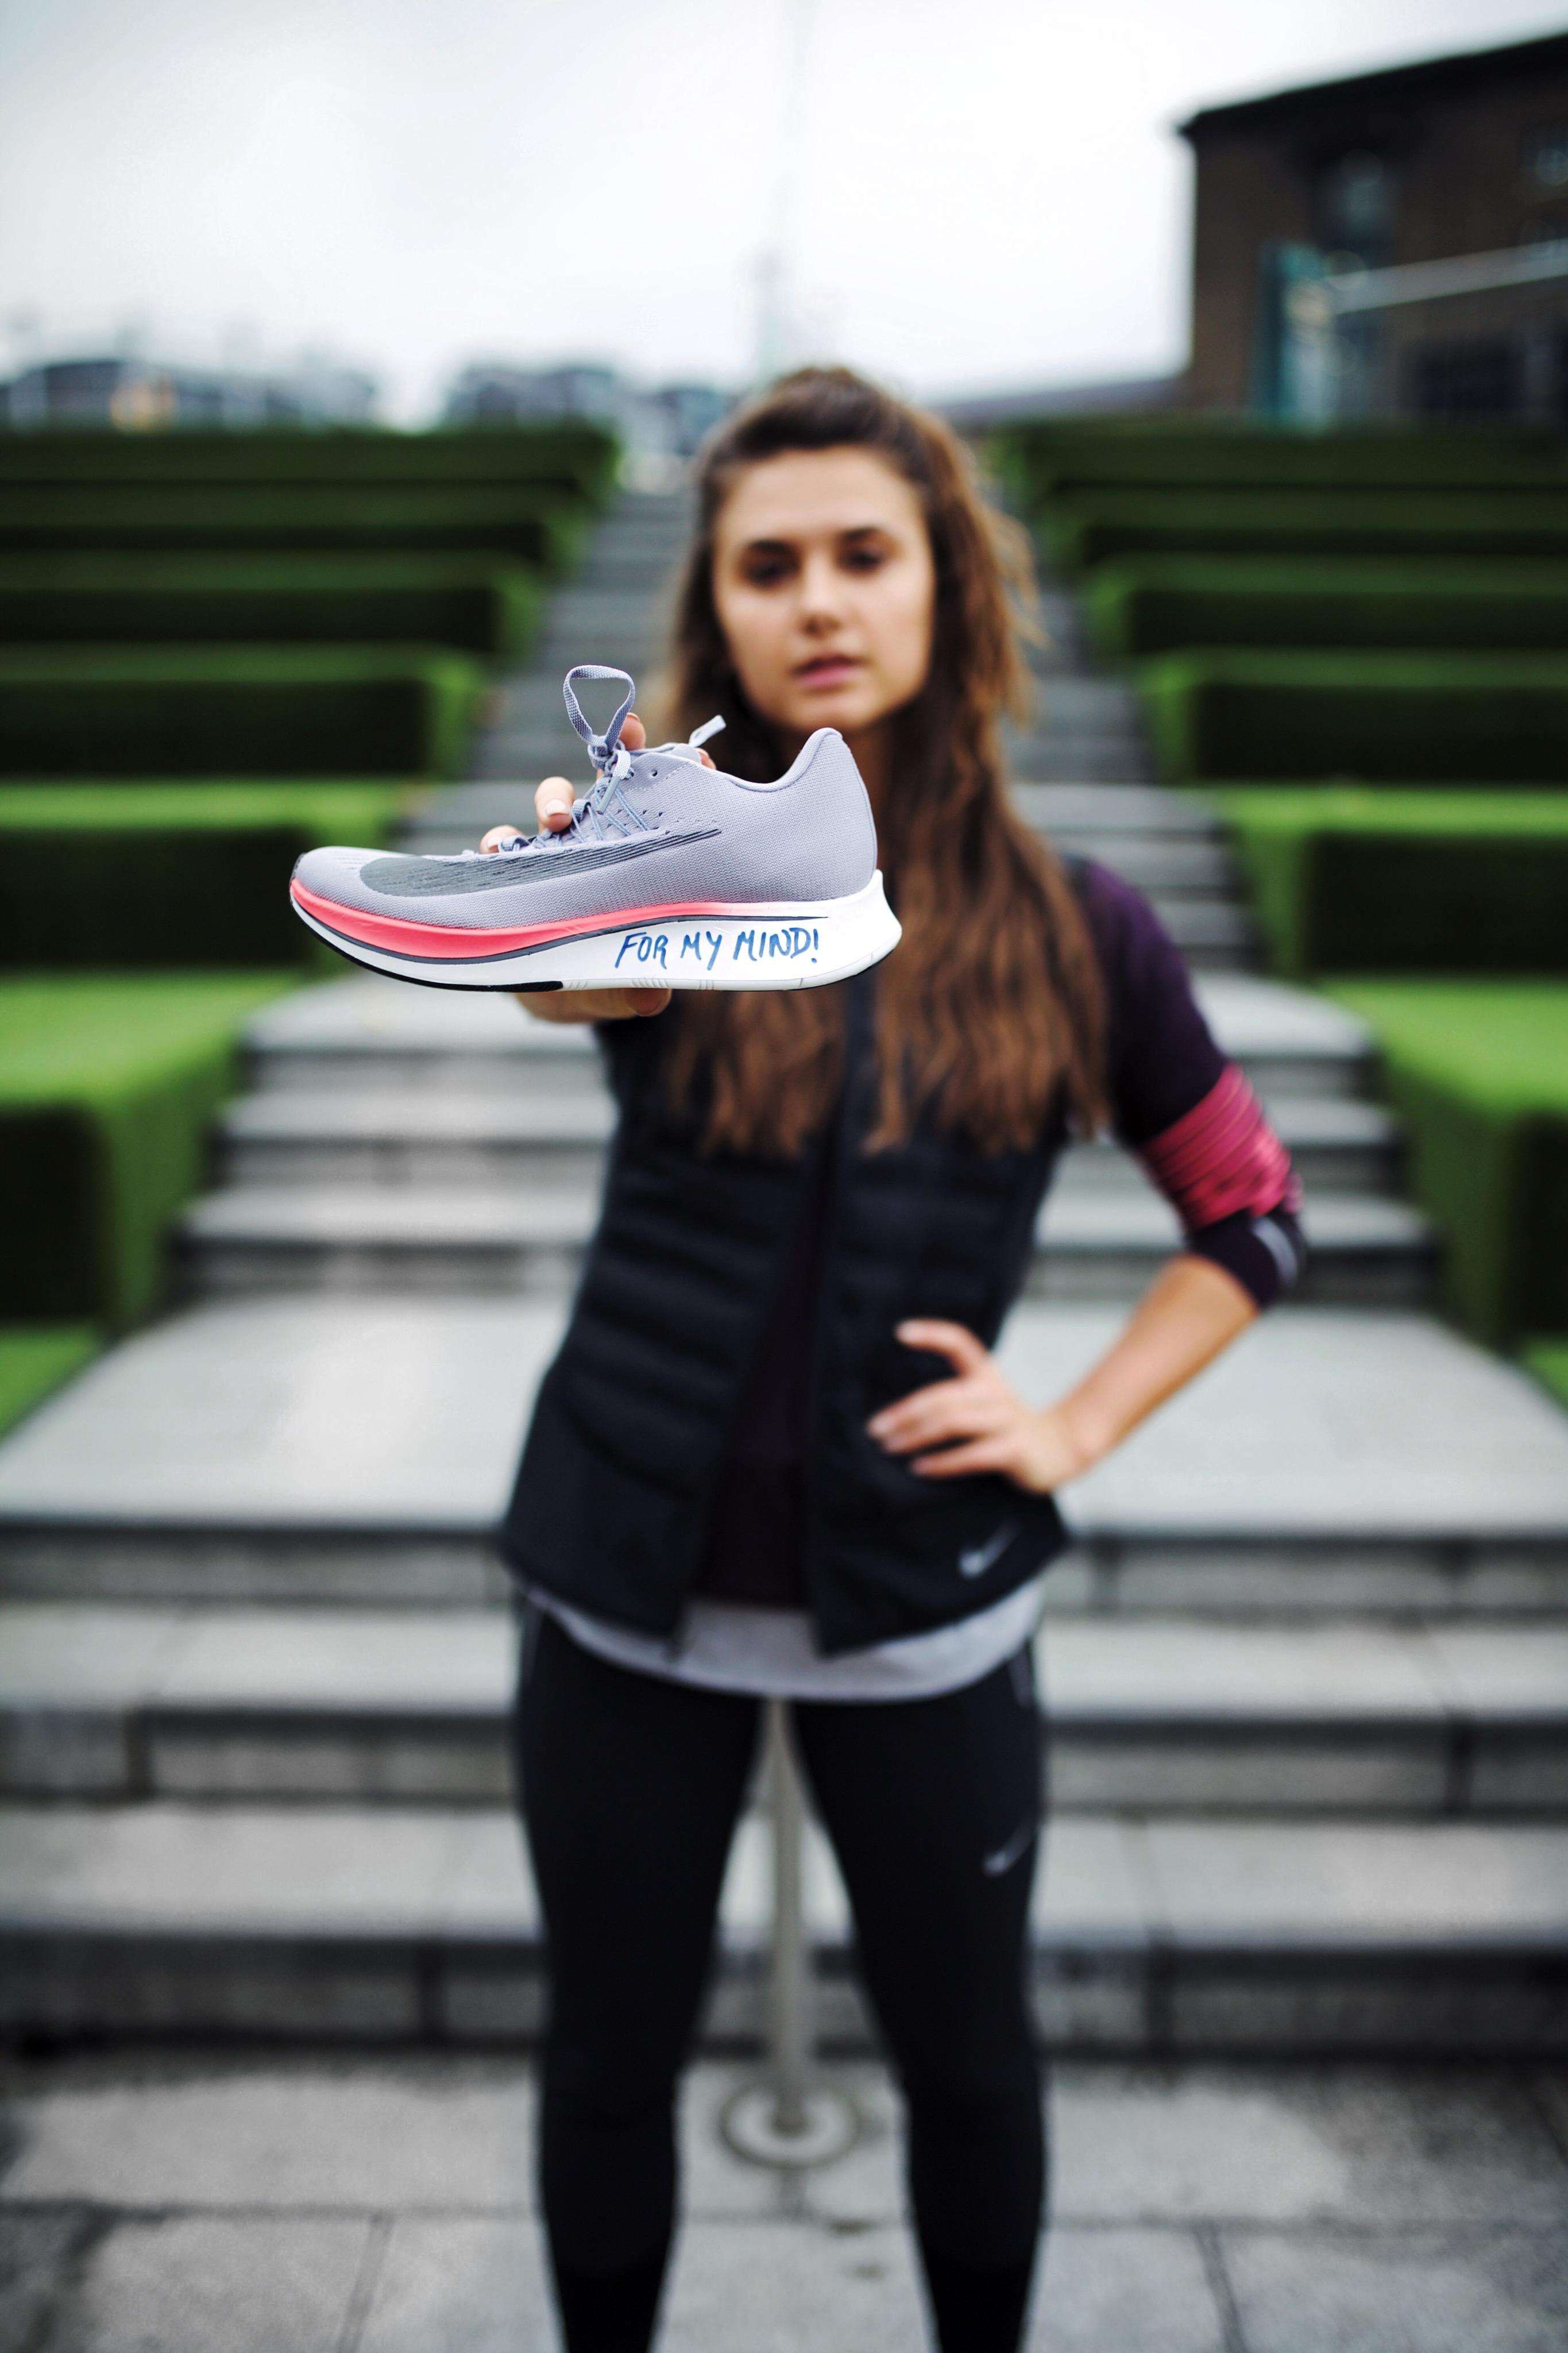 Mejorar maíz Recepción  My Running Story. | Natalie Glaze - A UK Lifestyle & Travel Blog